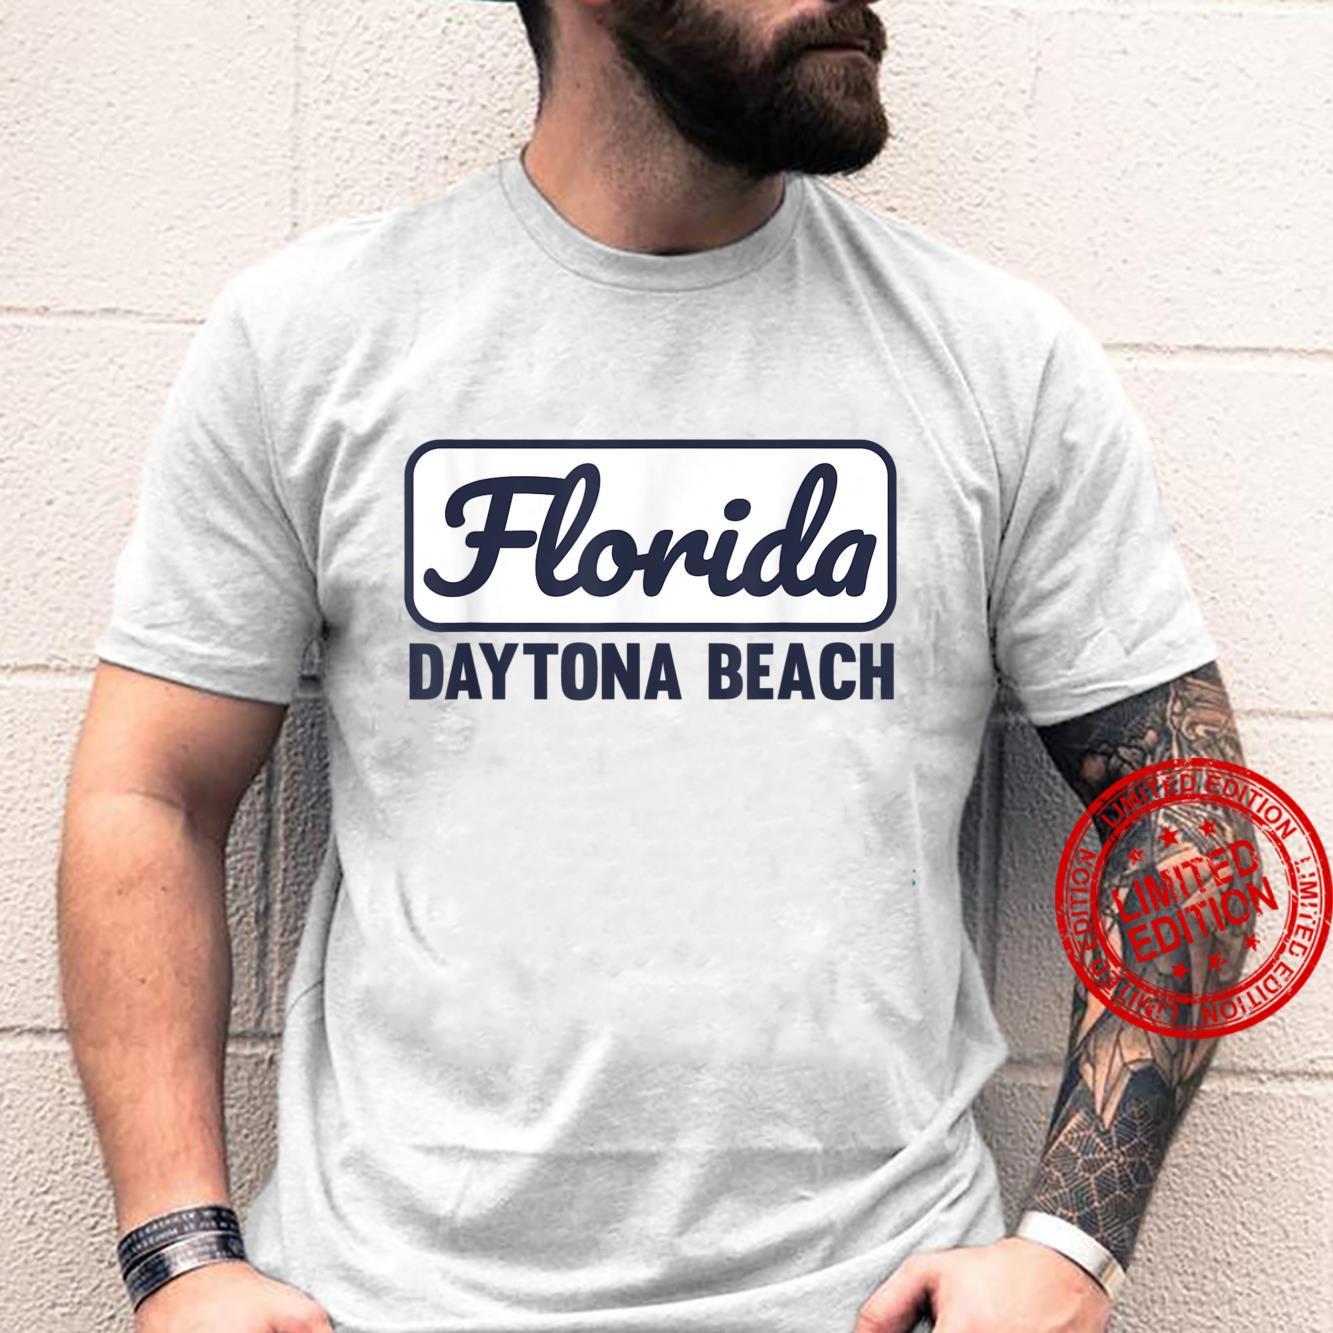 Daytona Beach FL Cool Designed Daytona Beach Florida Local Shirt